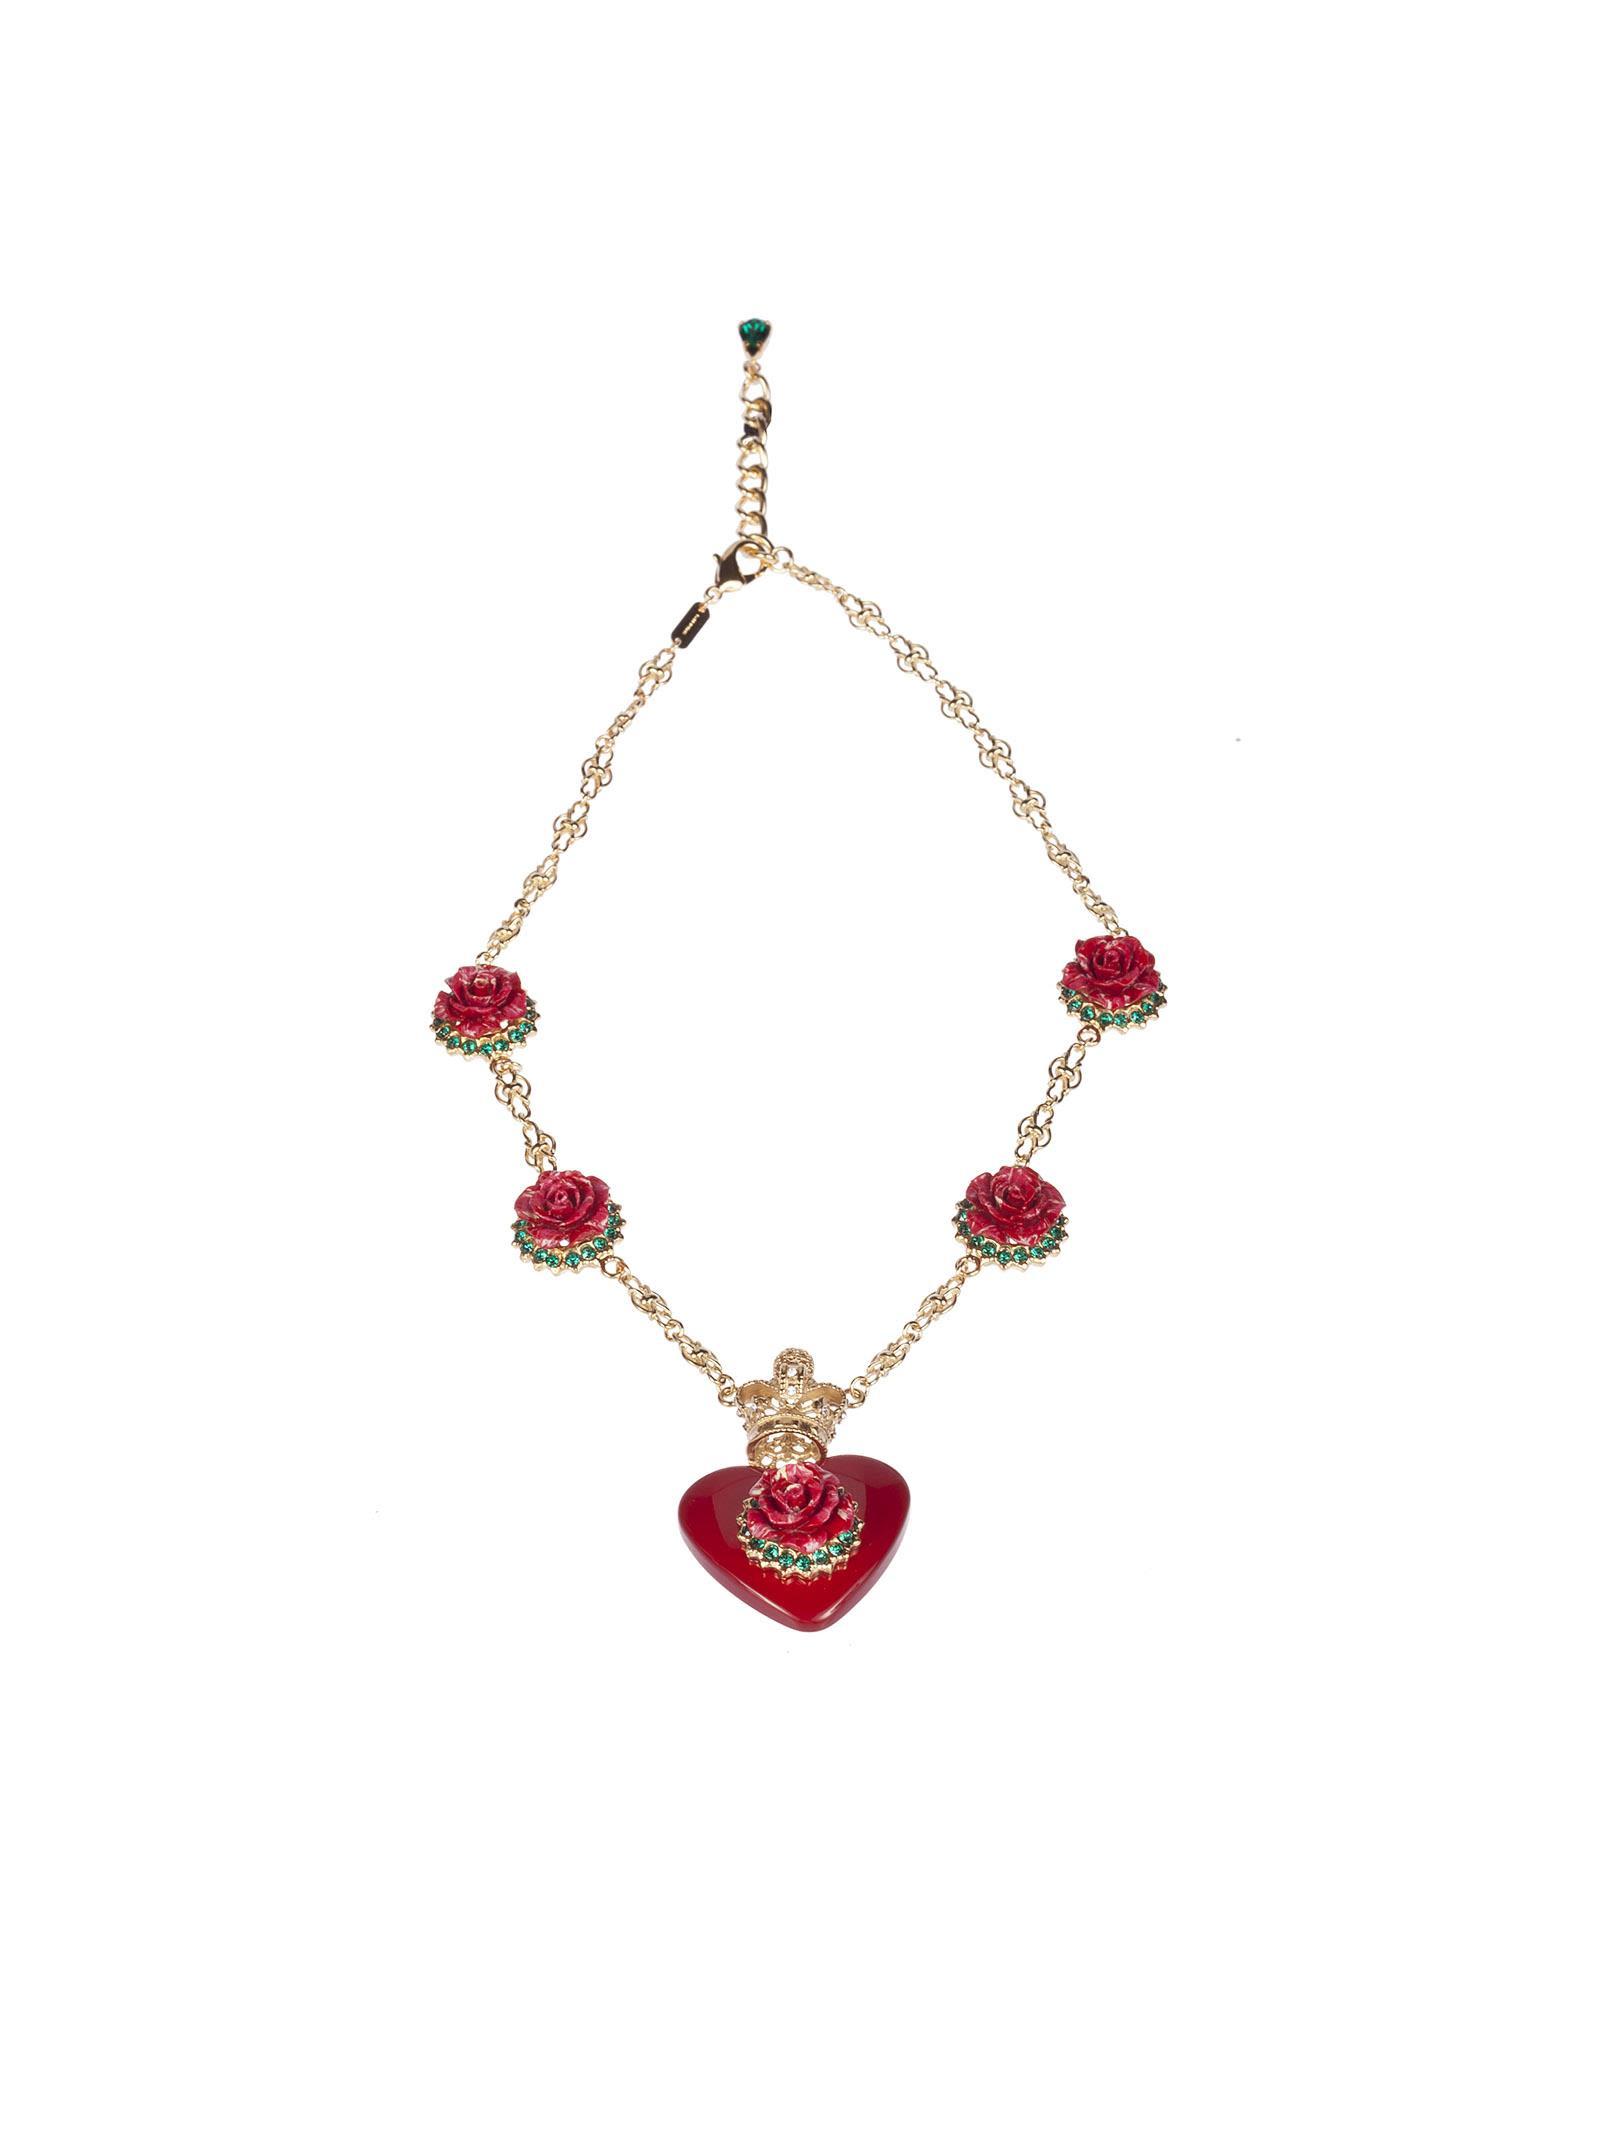 Dolce & Gabbana Heart Rose Pendant Necklace